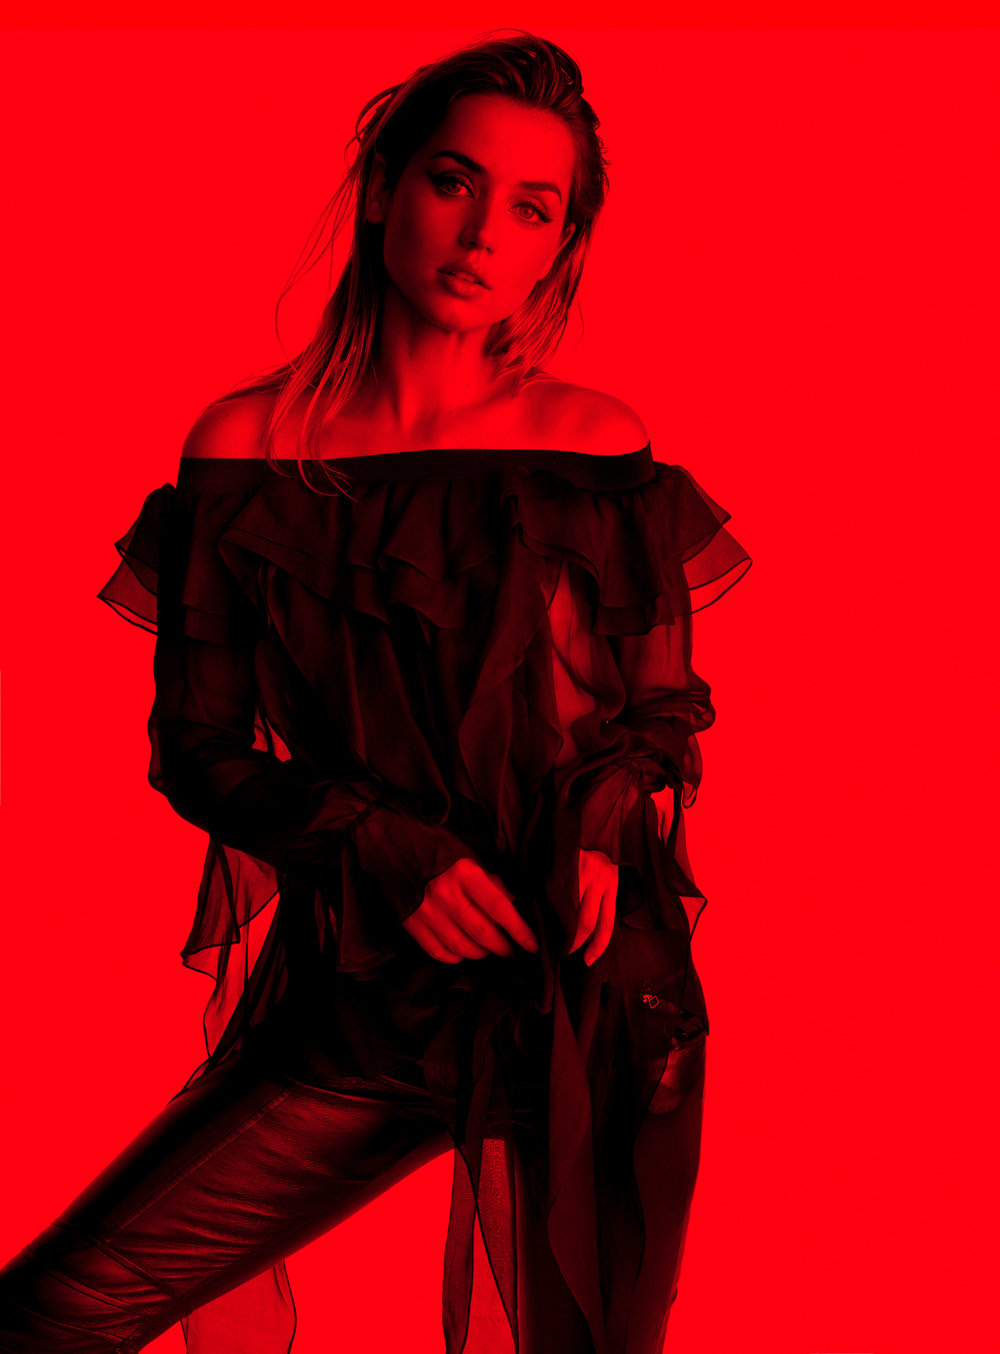 Ana de Armas  | CREDITS: PREEN BY THORNTON BREGAZZI  shirt and  AG  pants.